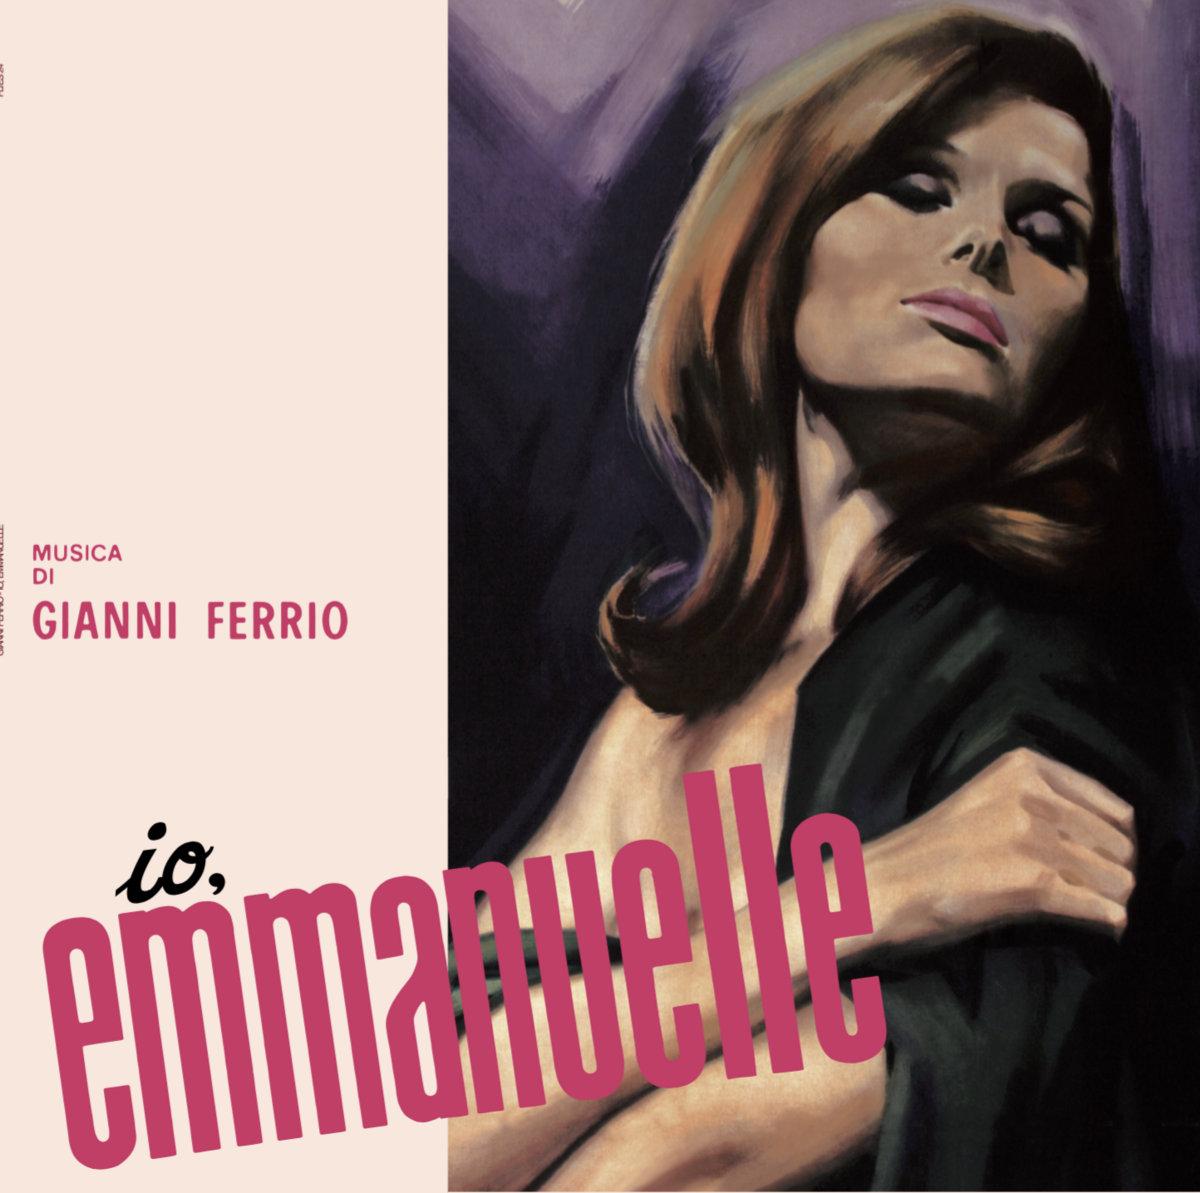 By Gianni Ferrio